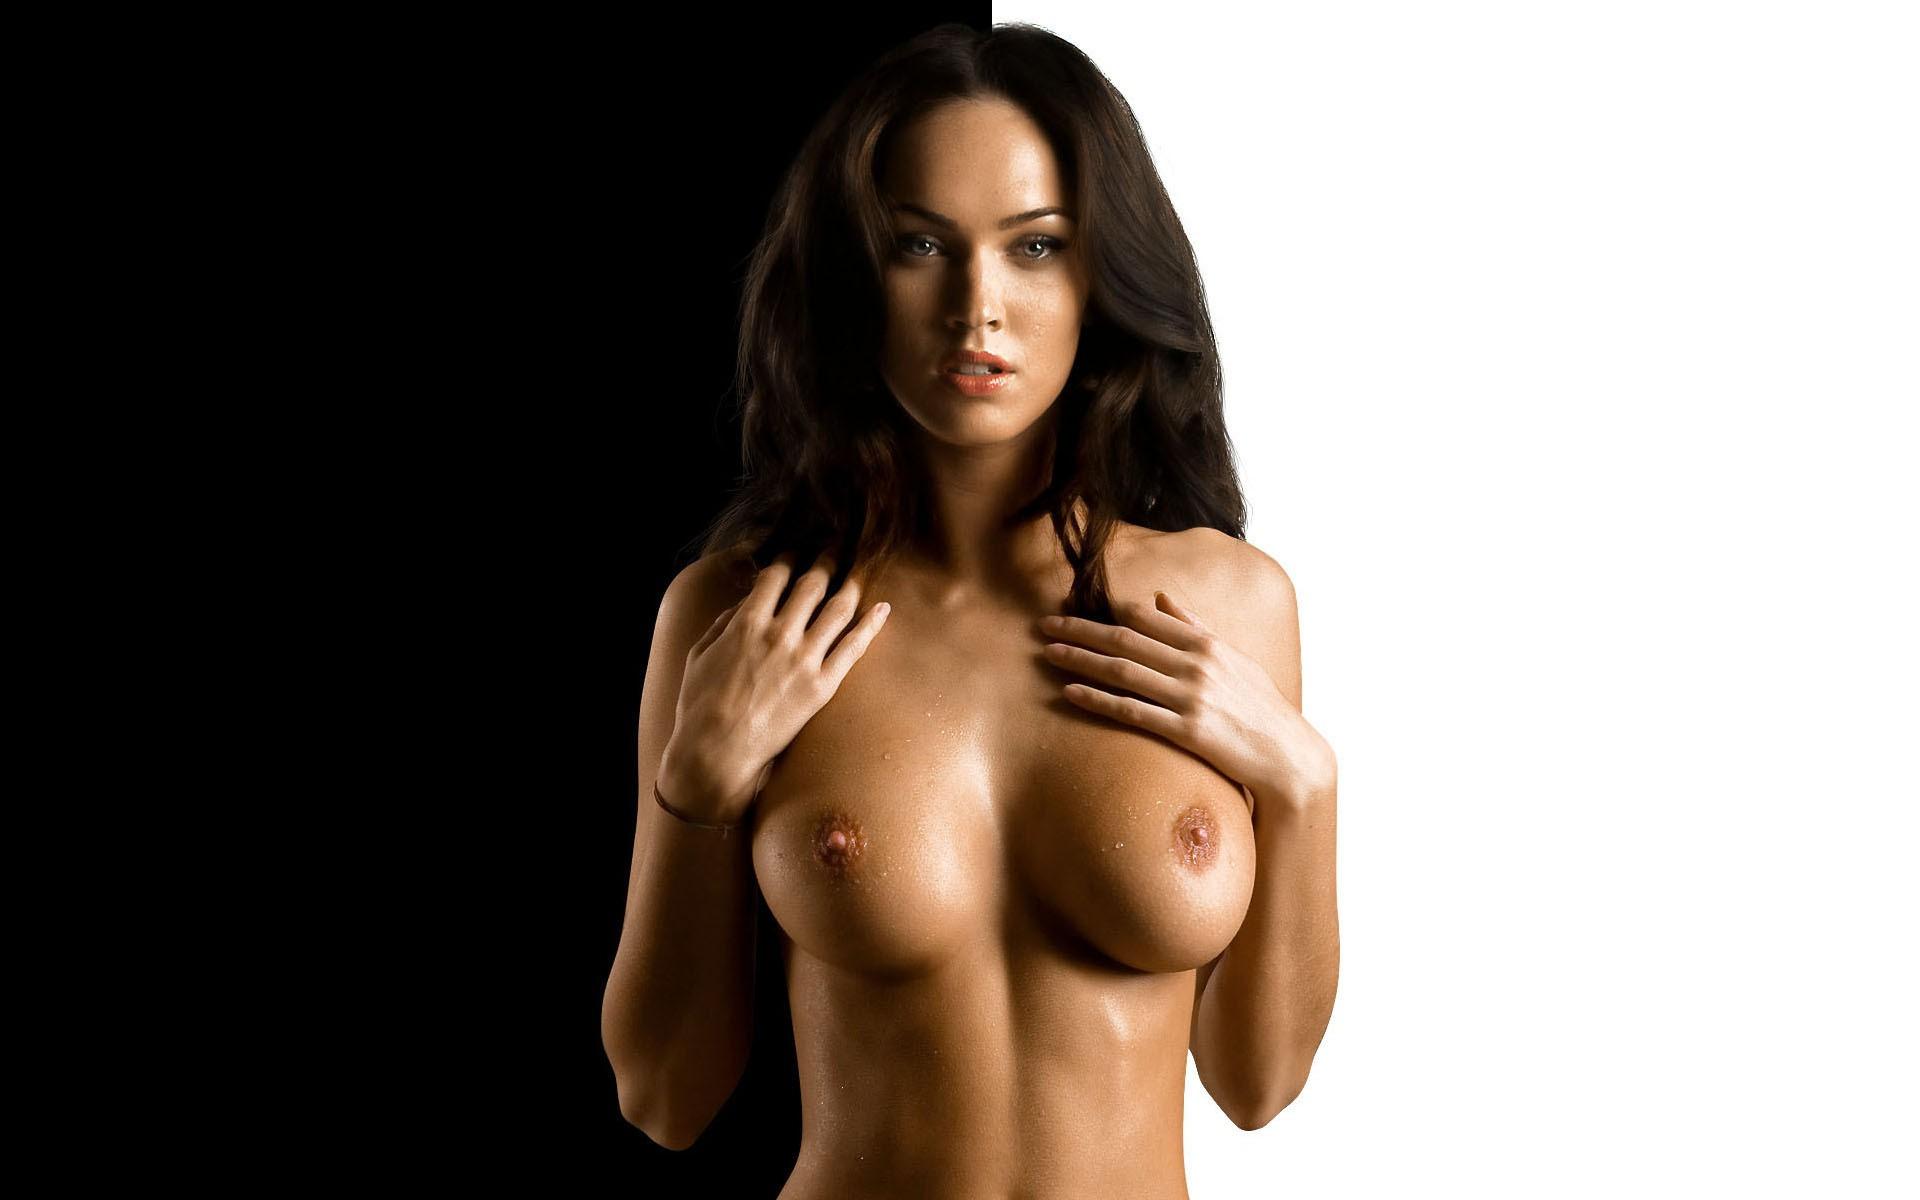 Megan fox uncensored nude